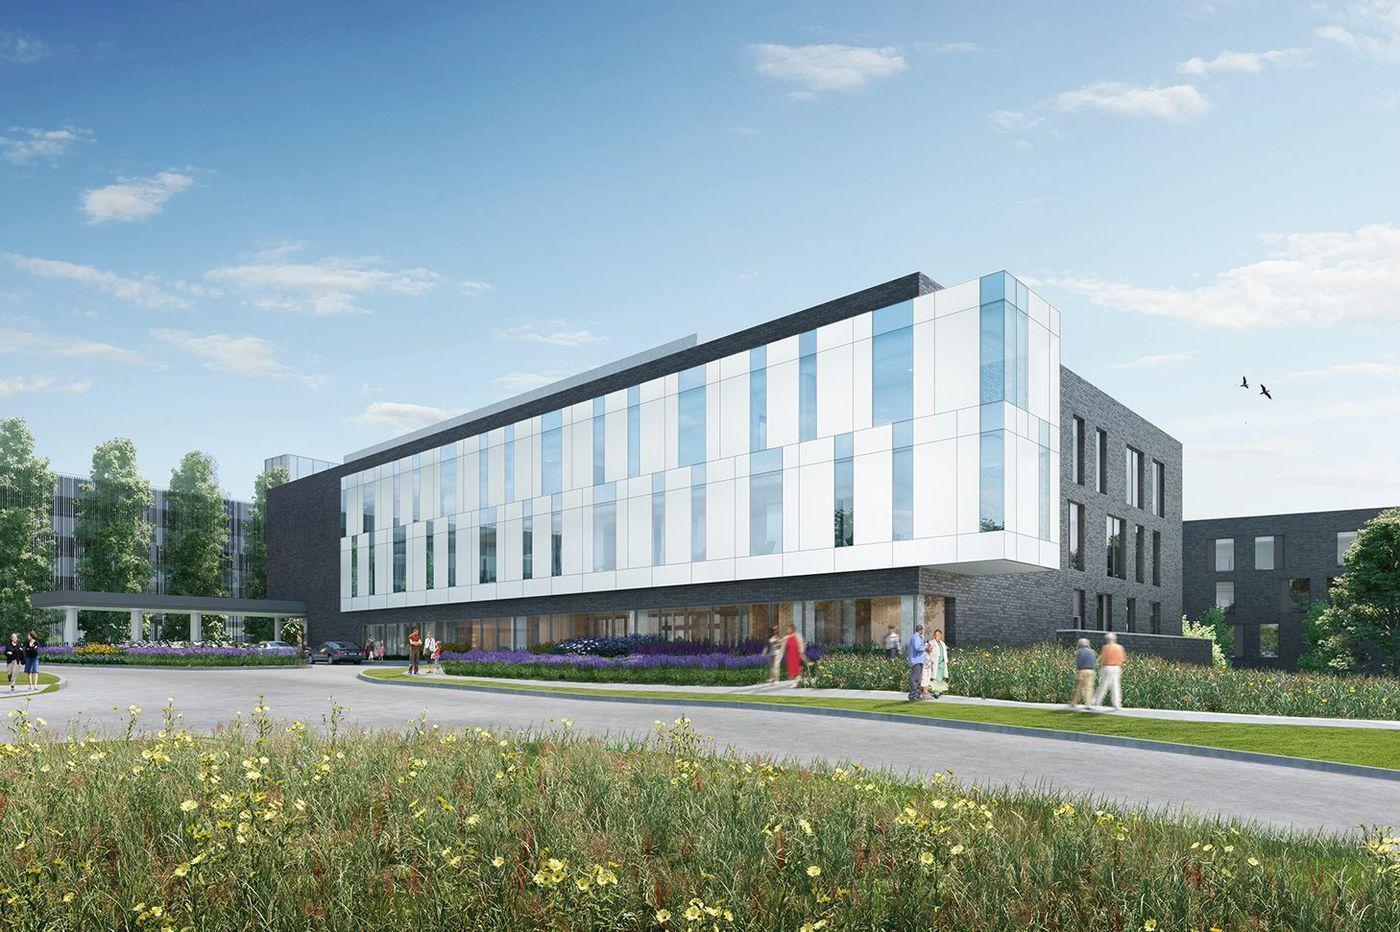 Penn breaks ground on $200M outpatient center in Radnor